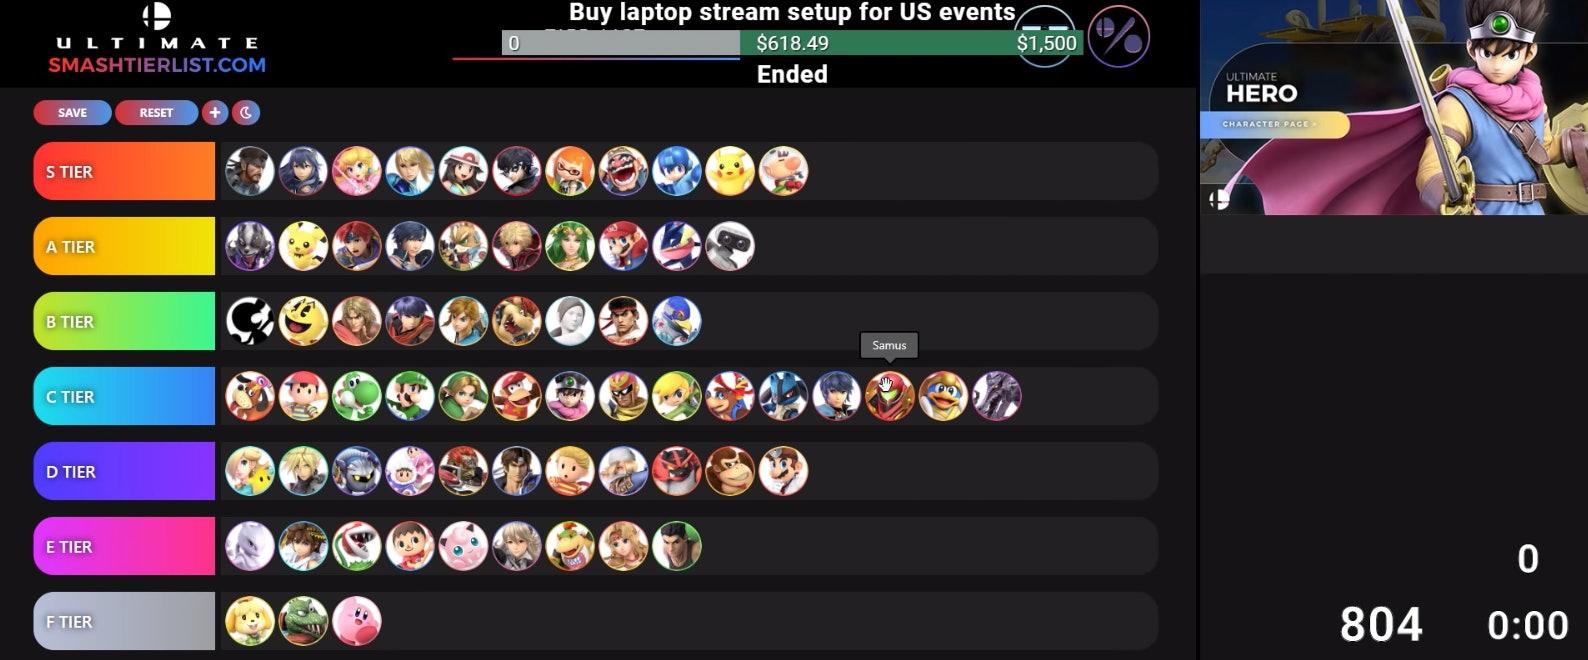 armada smash ultimate tier list 5.0